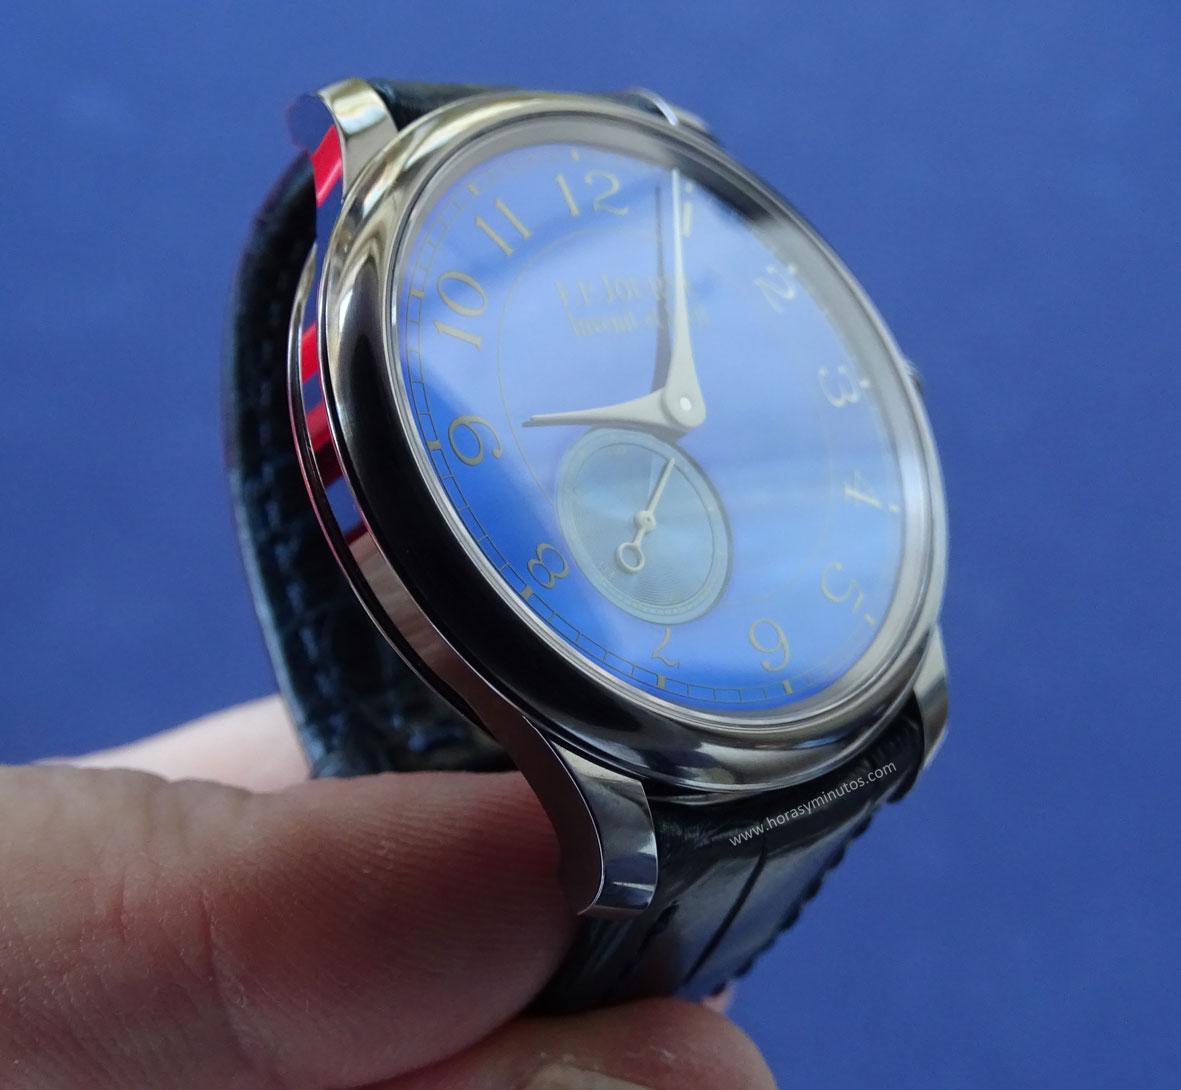 FP Journe Chronomètre Bleu perfil de la caja